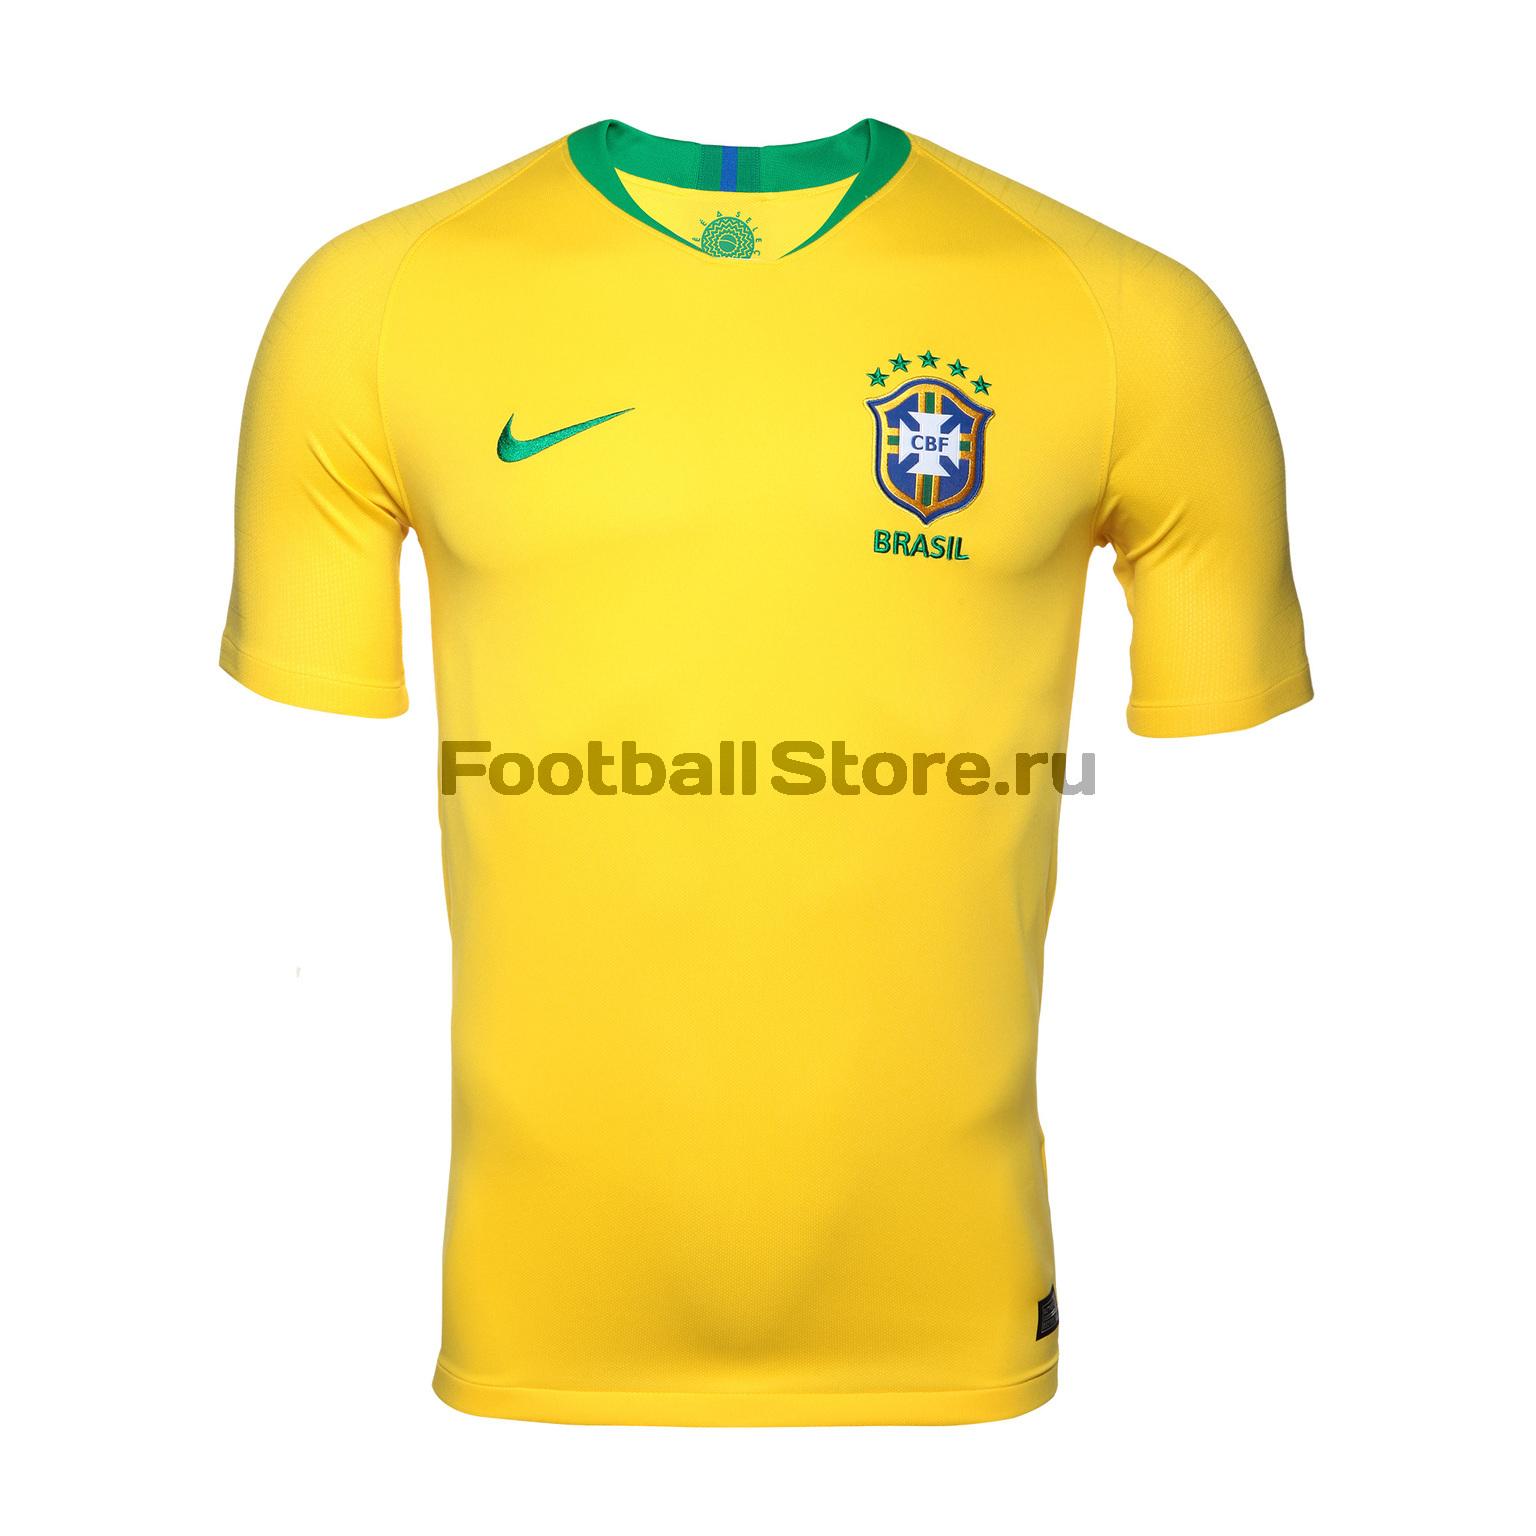 Футболка домашняя Nike сборной Бразилии 893856-749 оригинальная домашняя футболка nike дзюба 22 2018 19 nike